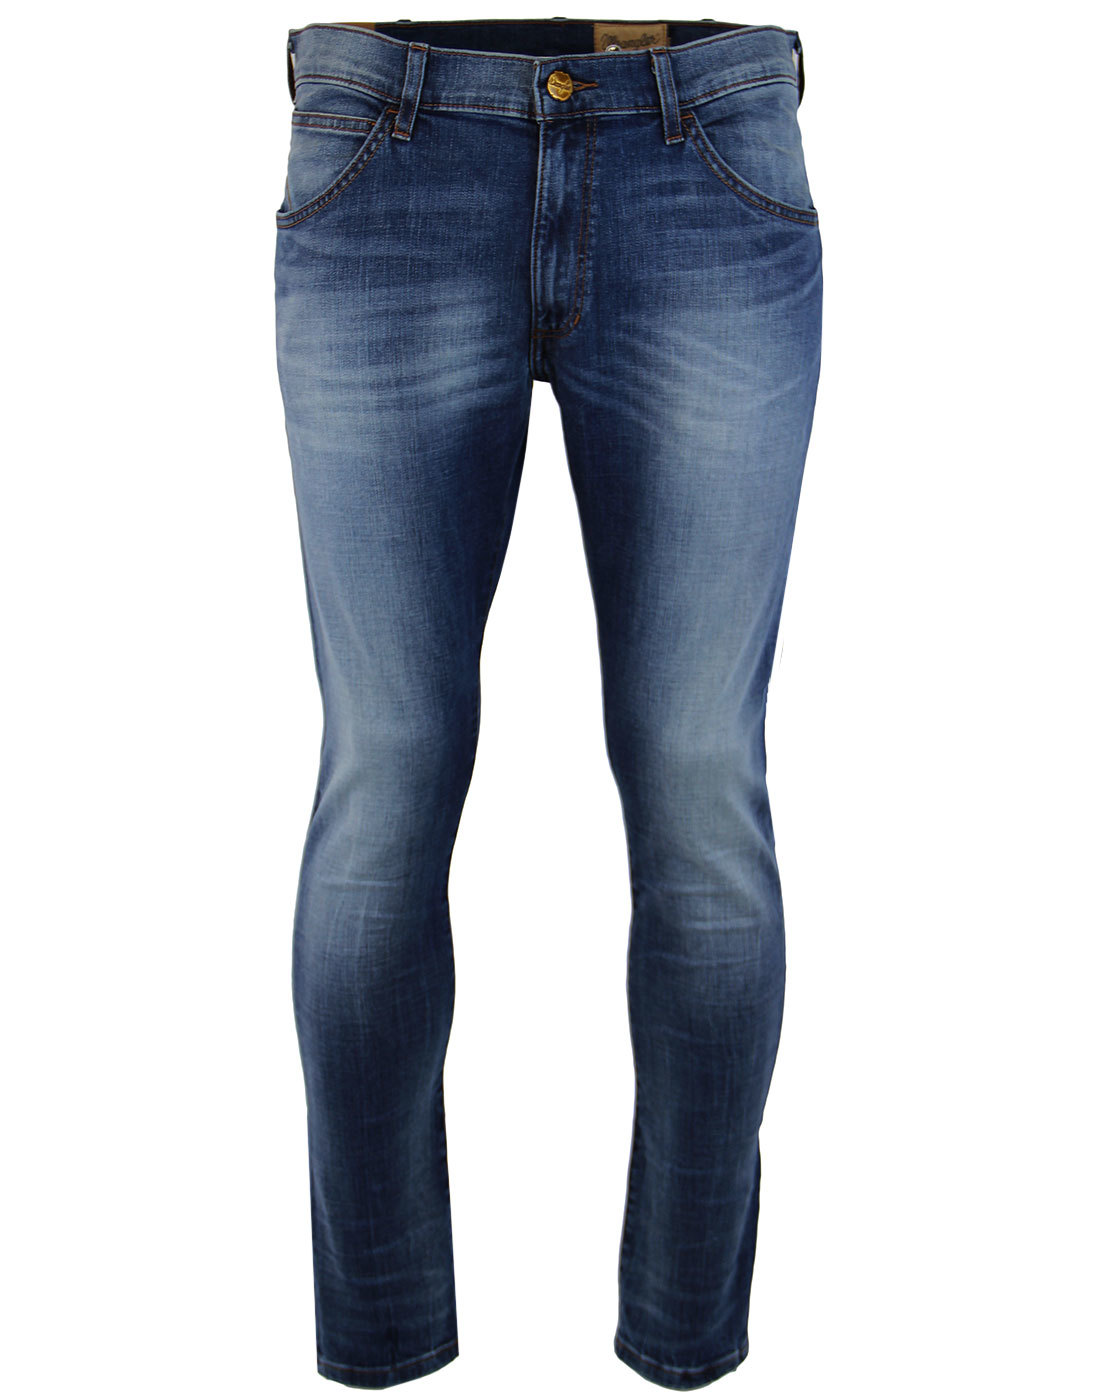 2b0a0e78 WRANGLER Bryson Retro Indie Fired Up Skinny Low Waist Denim Jeans